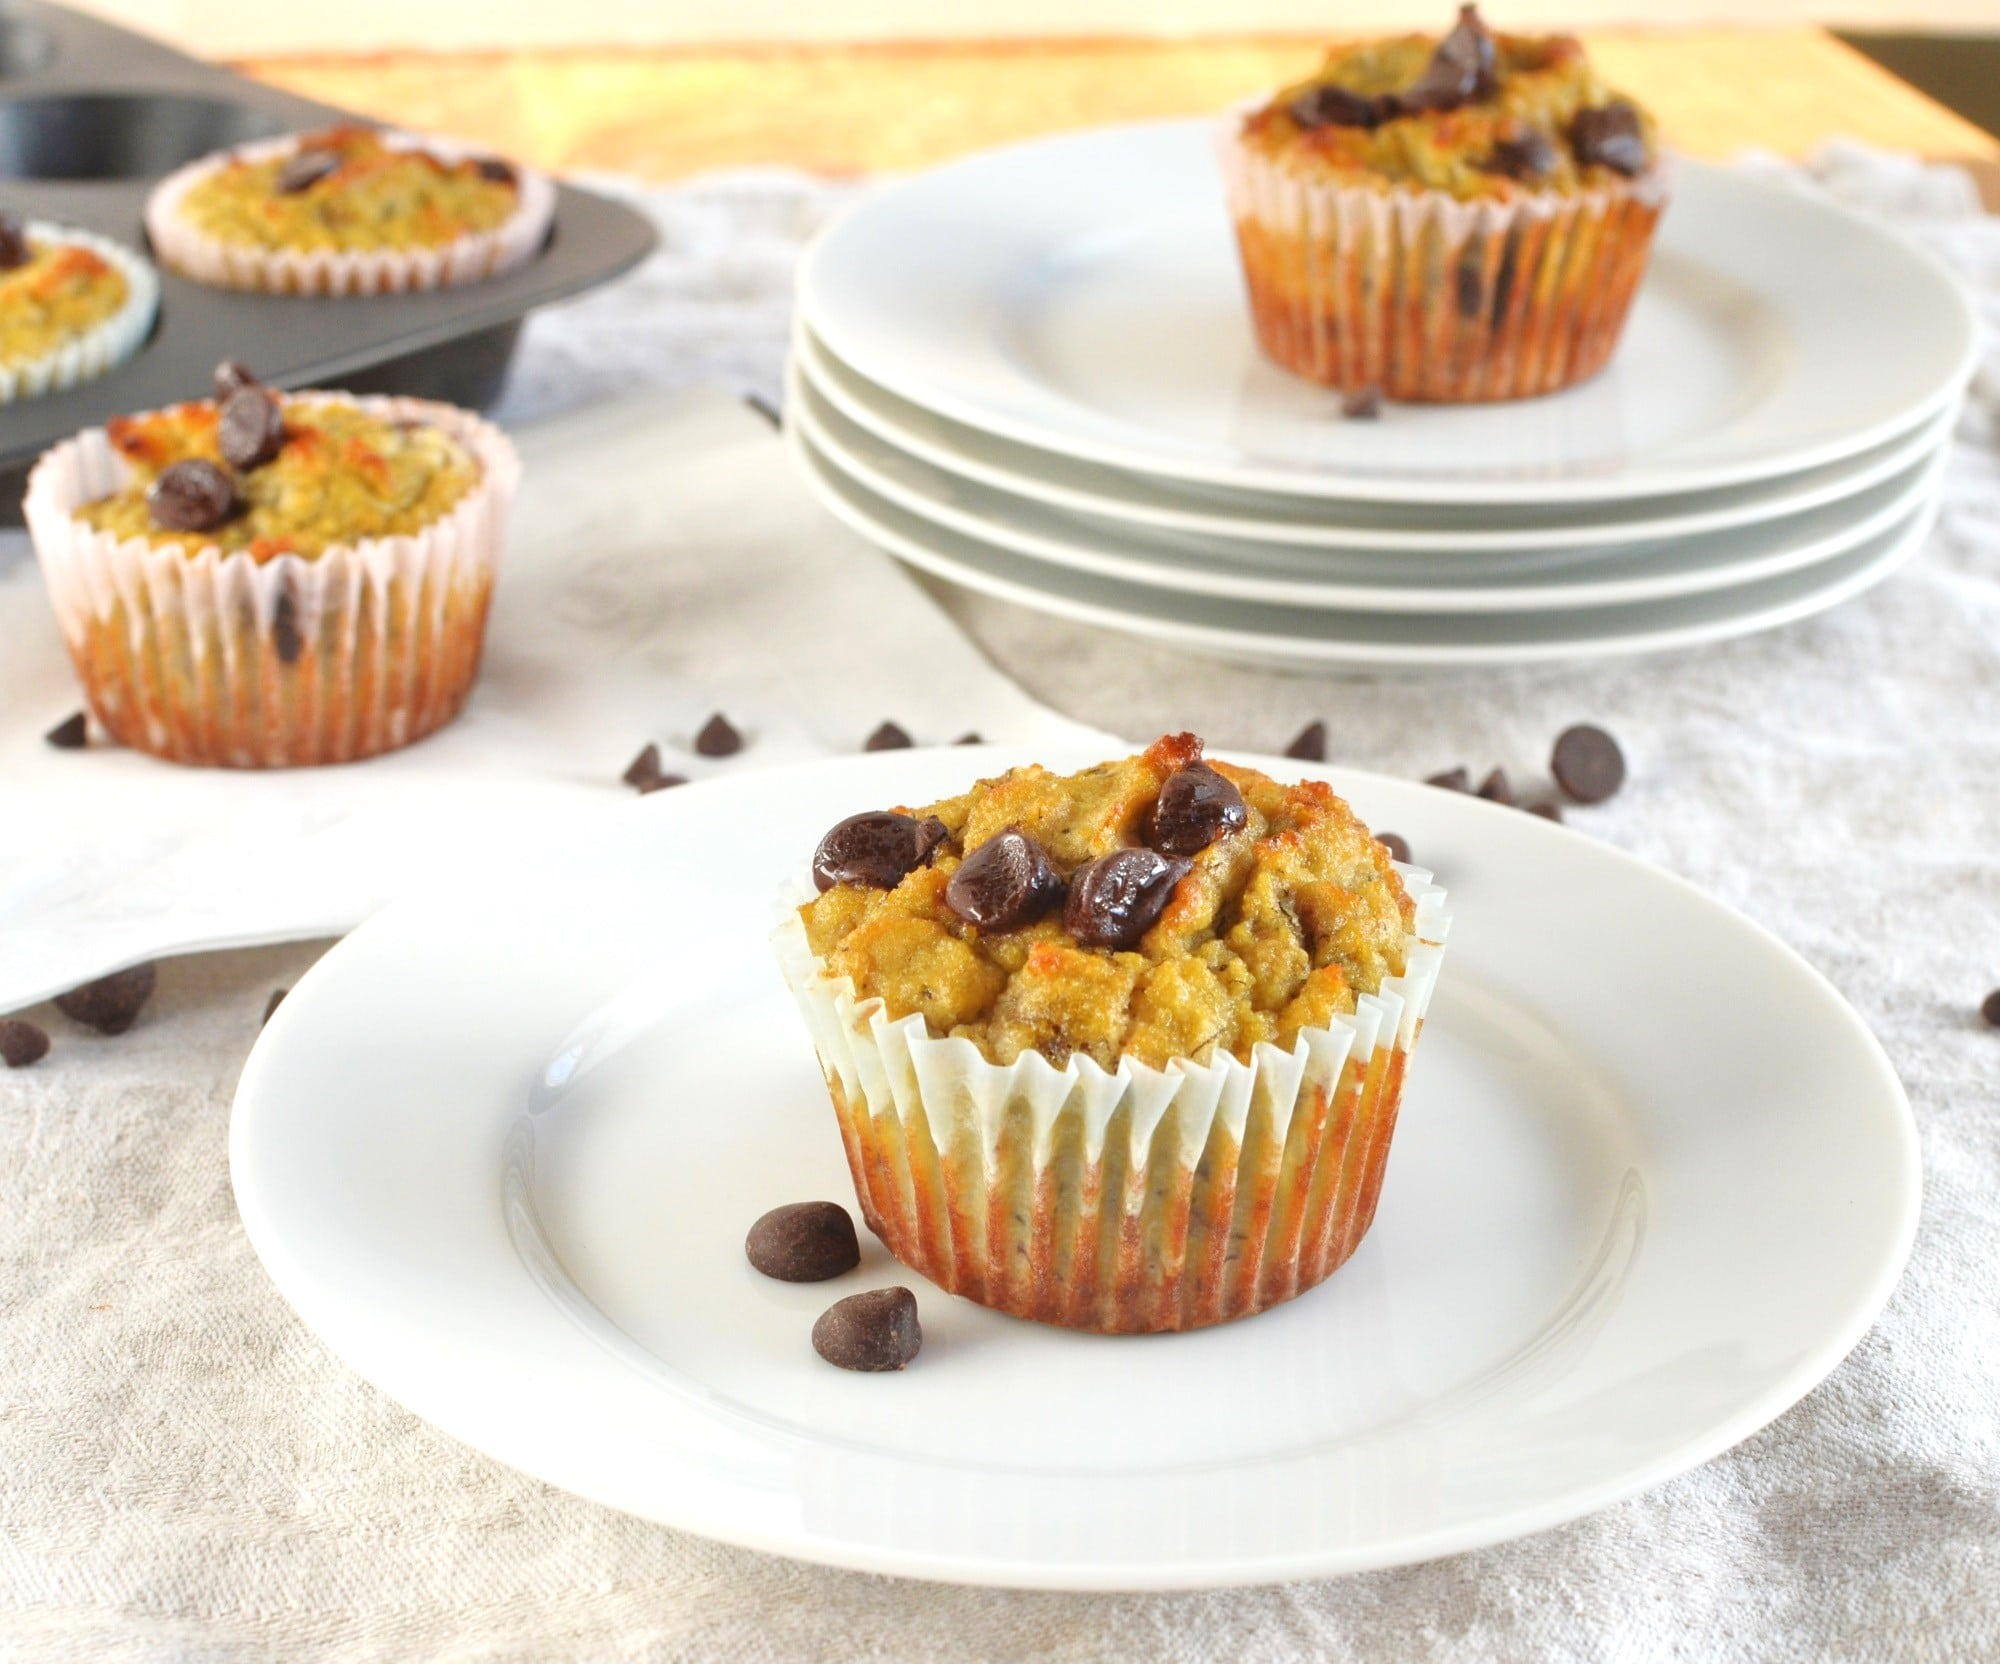 The BEST Gluten-Free Banana Chocolate Chip Muffins - 24 Carrot Kitchen